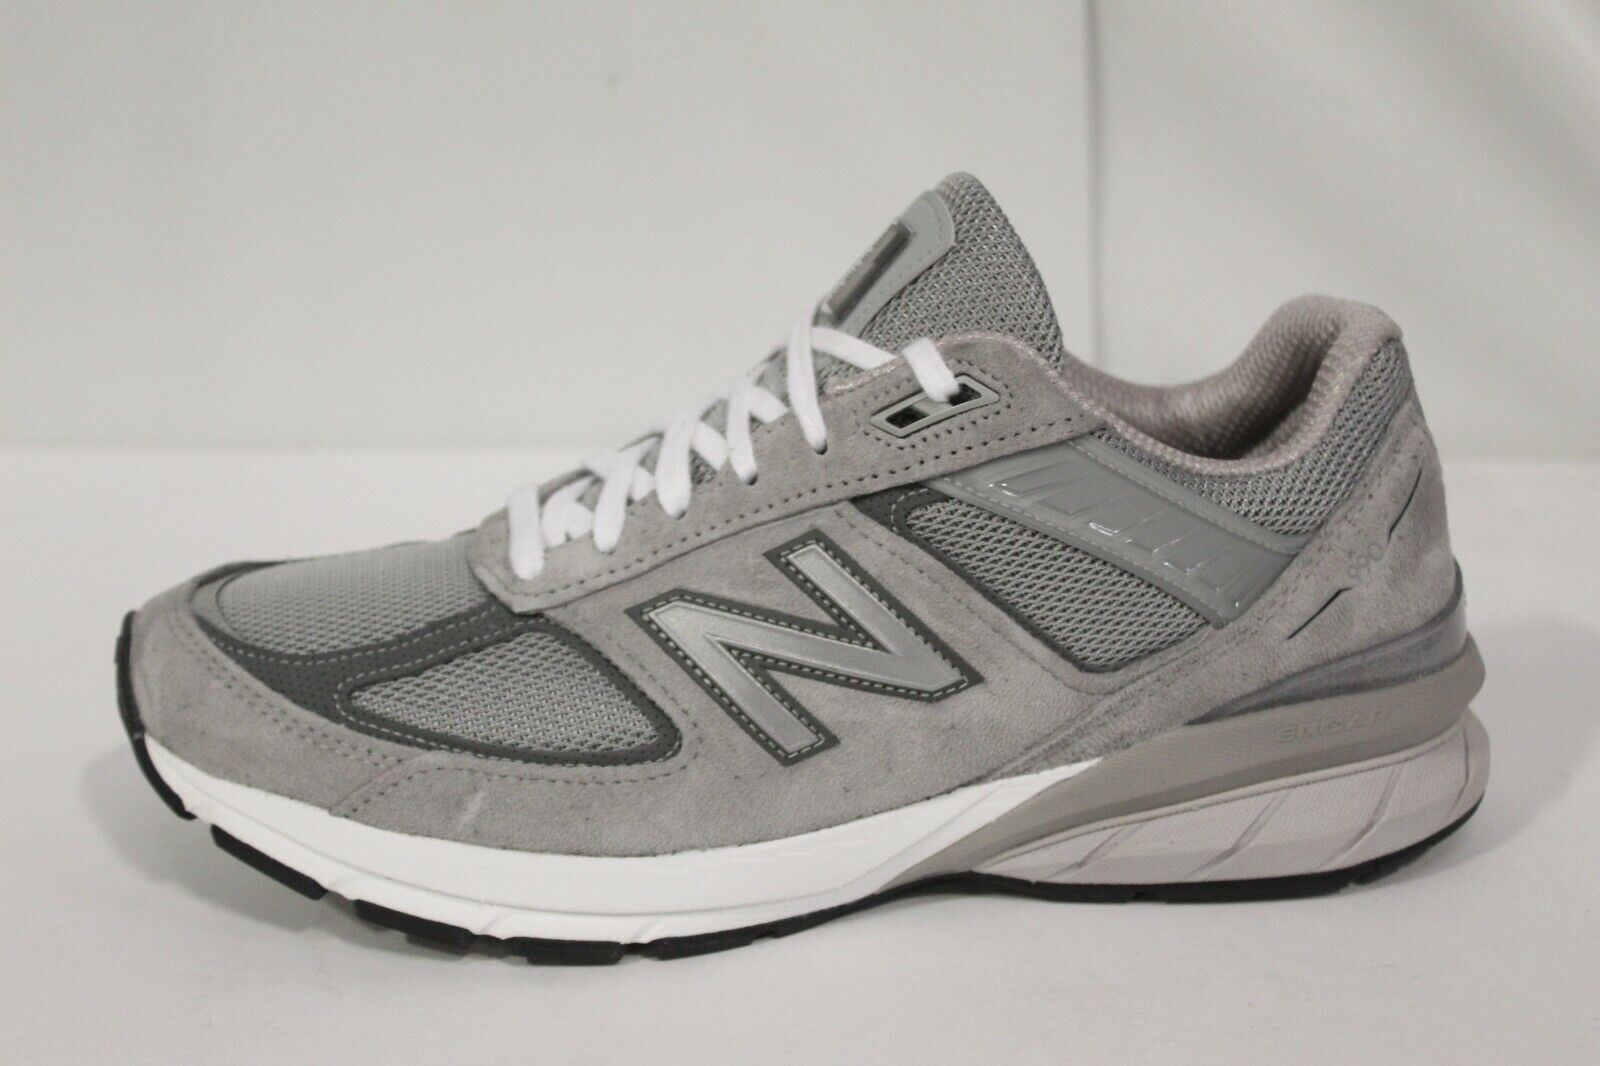 New Balance 990v5 Men's Walking Shoes Sz 9.5 D (S-6018)